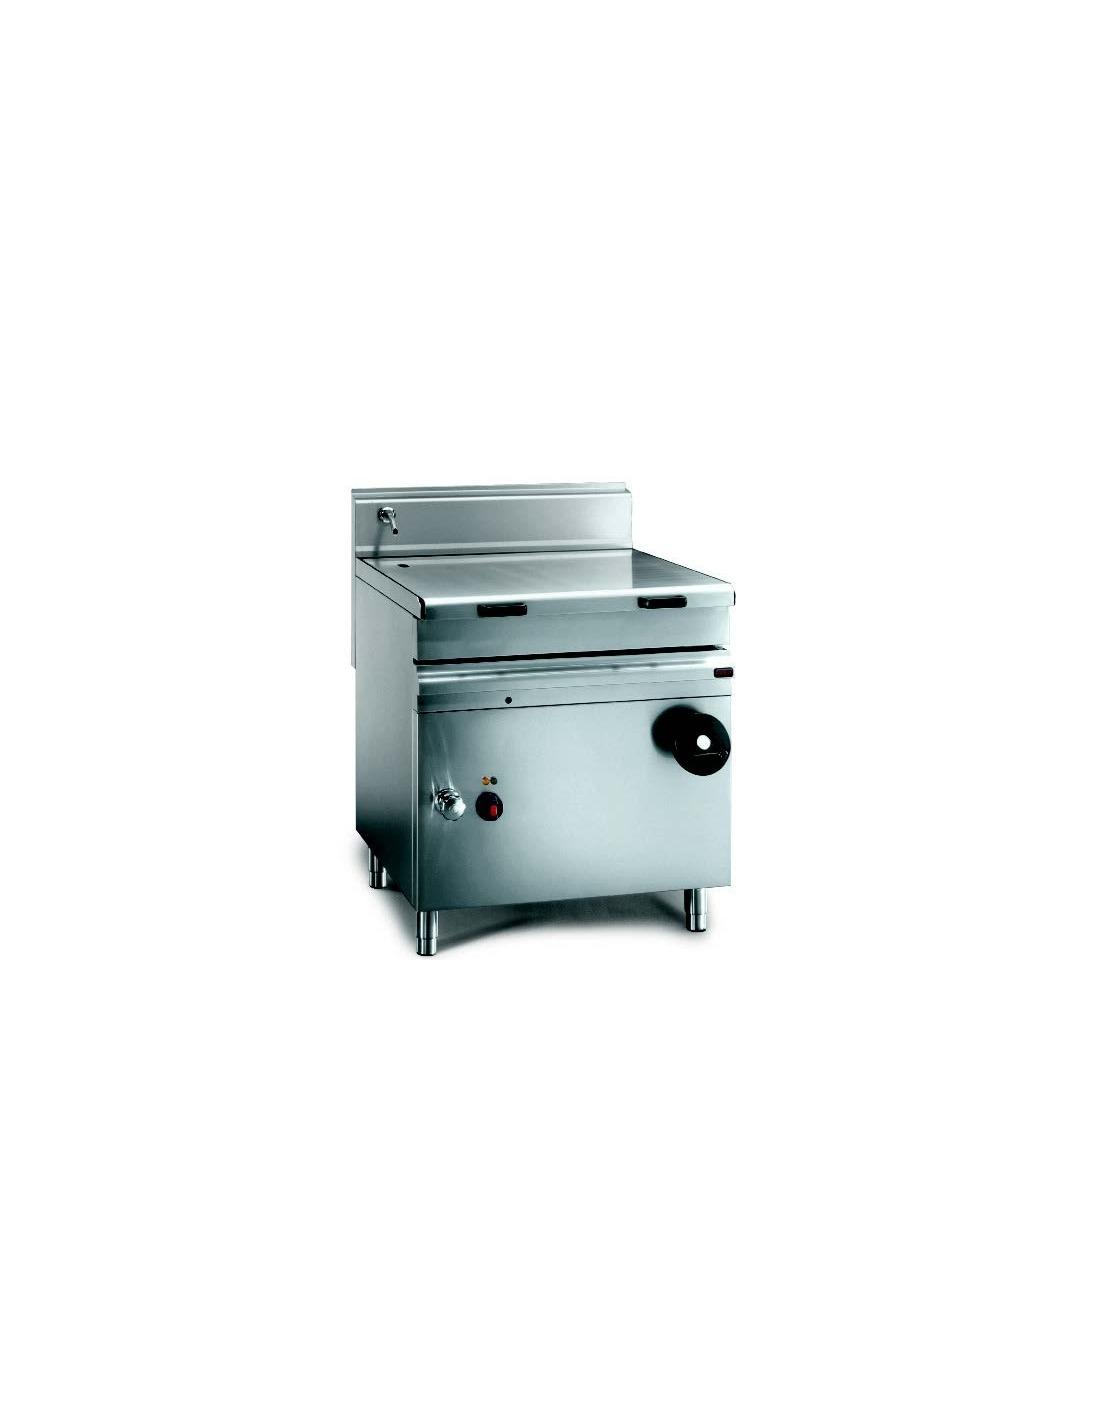 Suministros industriales sarten modular for Sartenes industriales